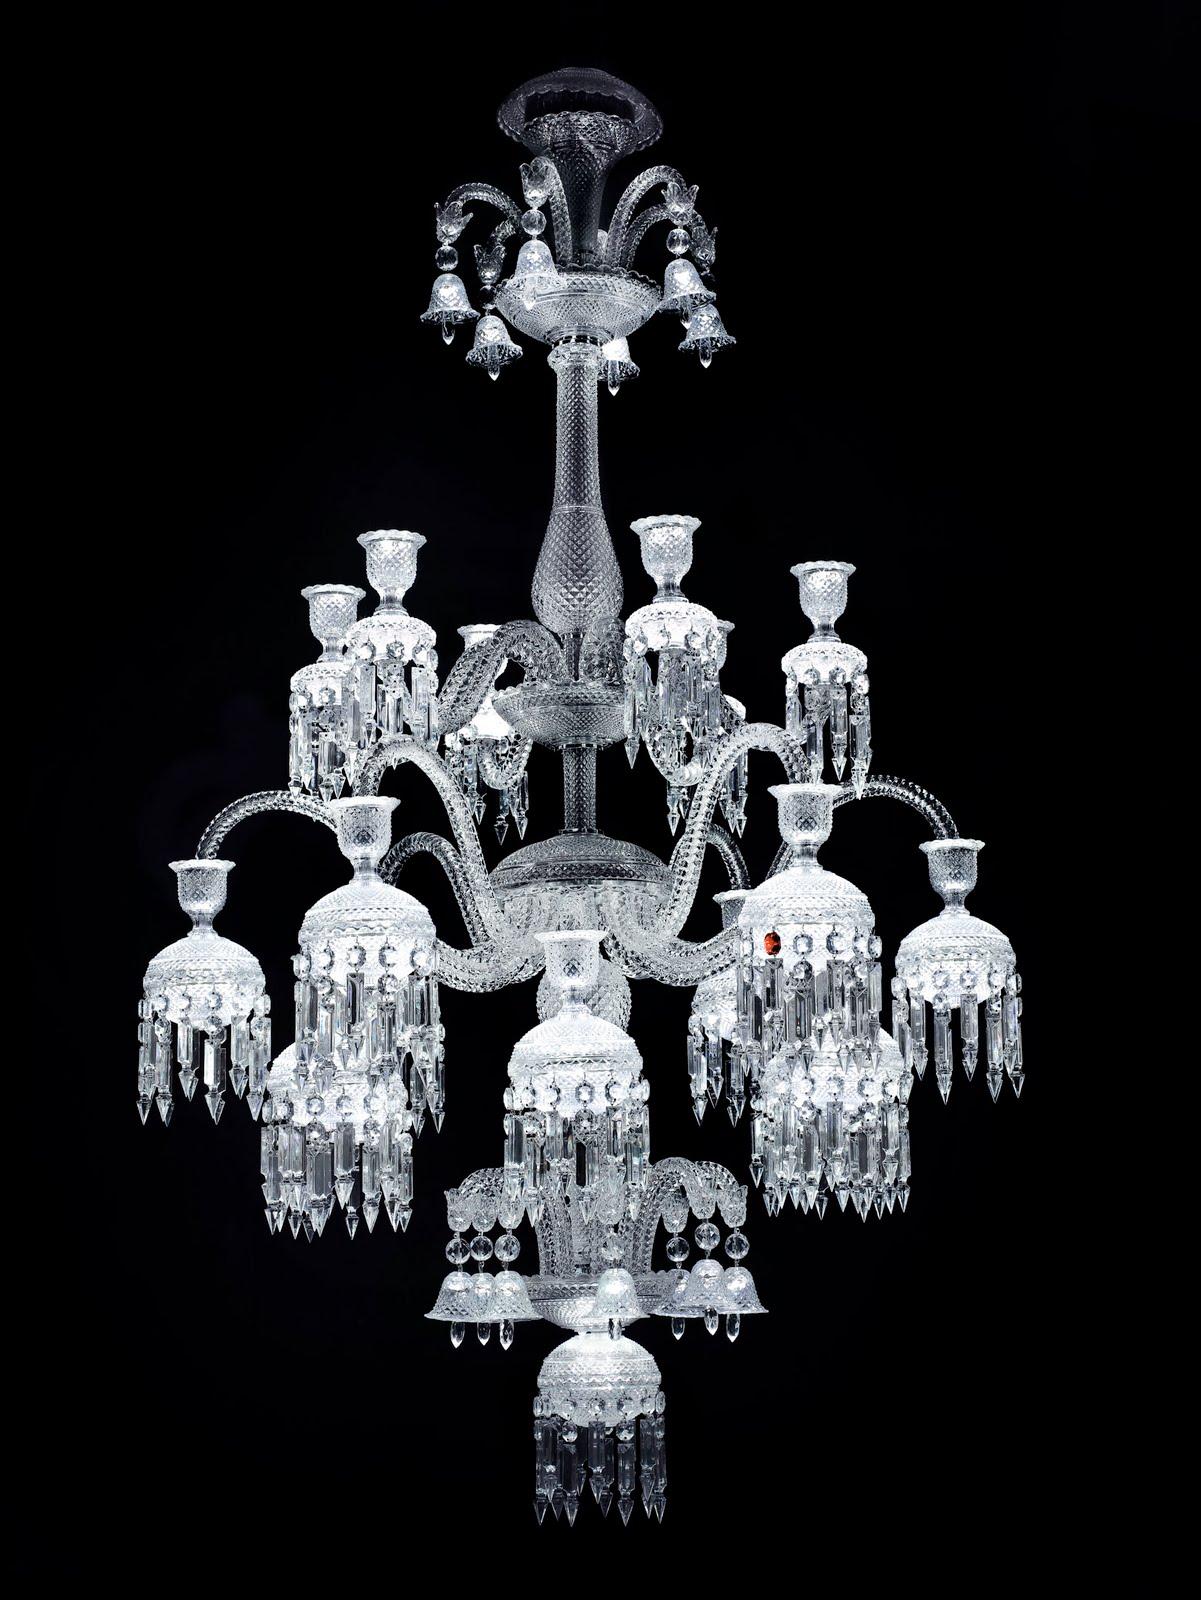 black zenith baccarat chandelier baccarat crystal chandeliers chandeliers baccarat zenith arm black crystal chandelier